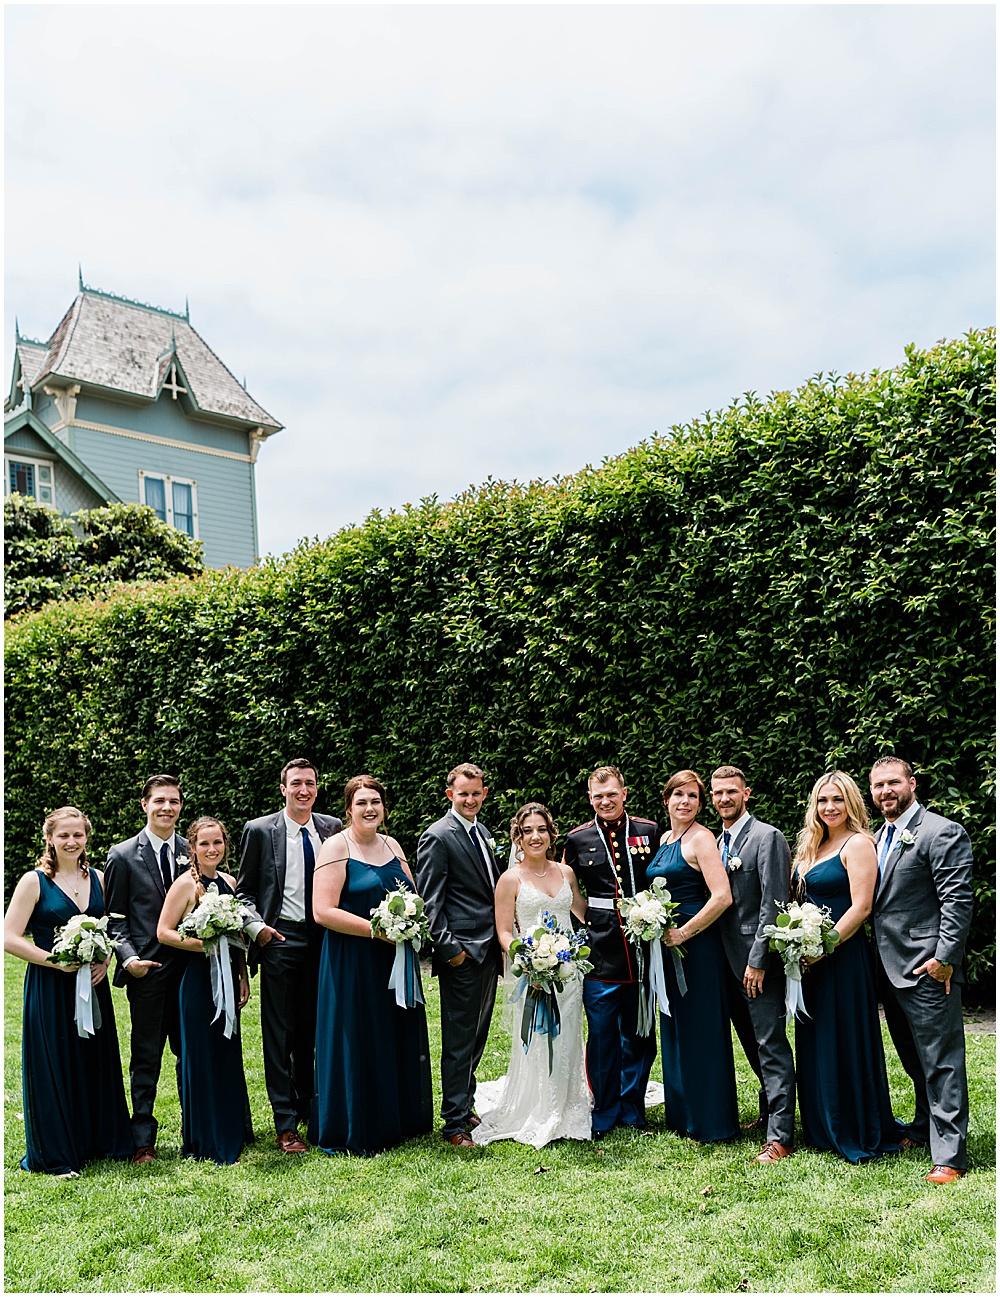 Samantha McPherrin Photography-Chico Wedding Photographer_0056.jpg